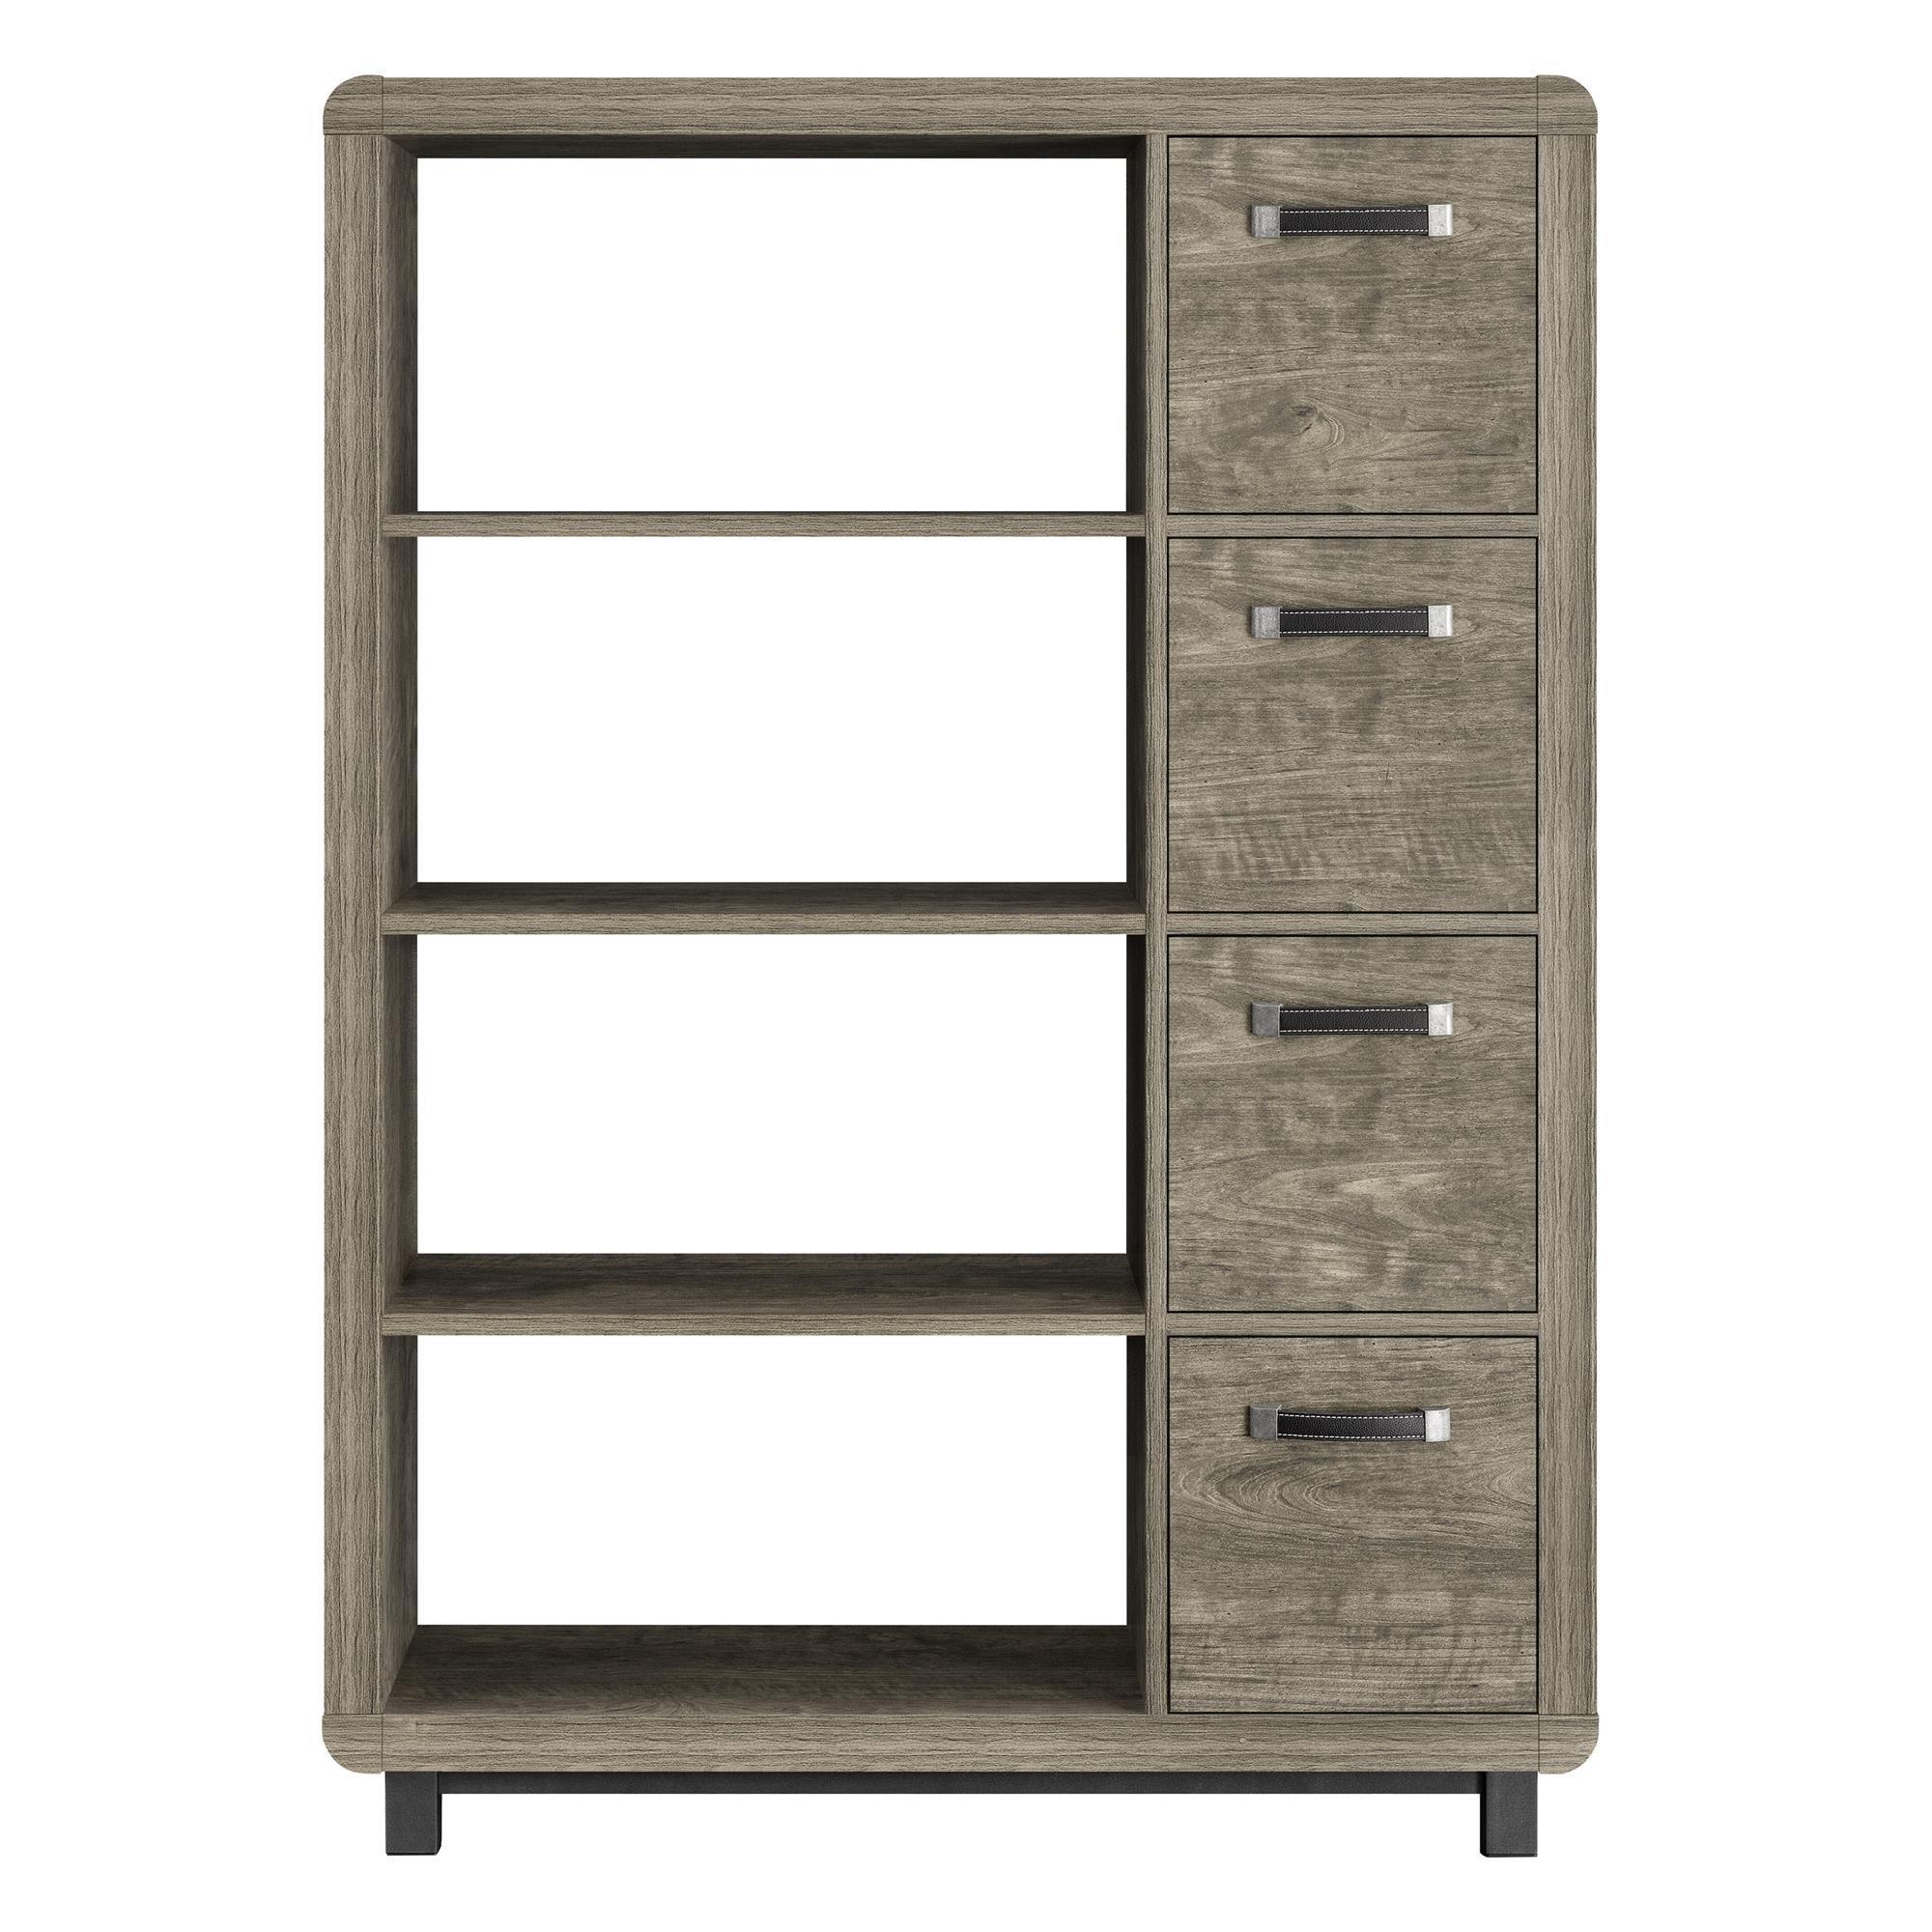 Ameriwood Home Eastlin Bookcase with Bins, Brown